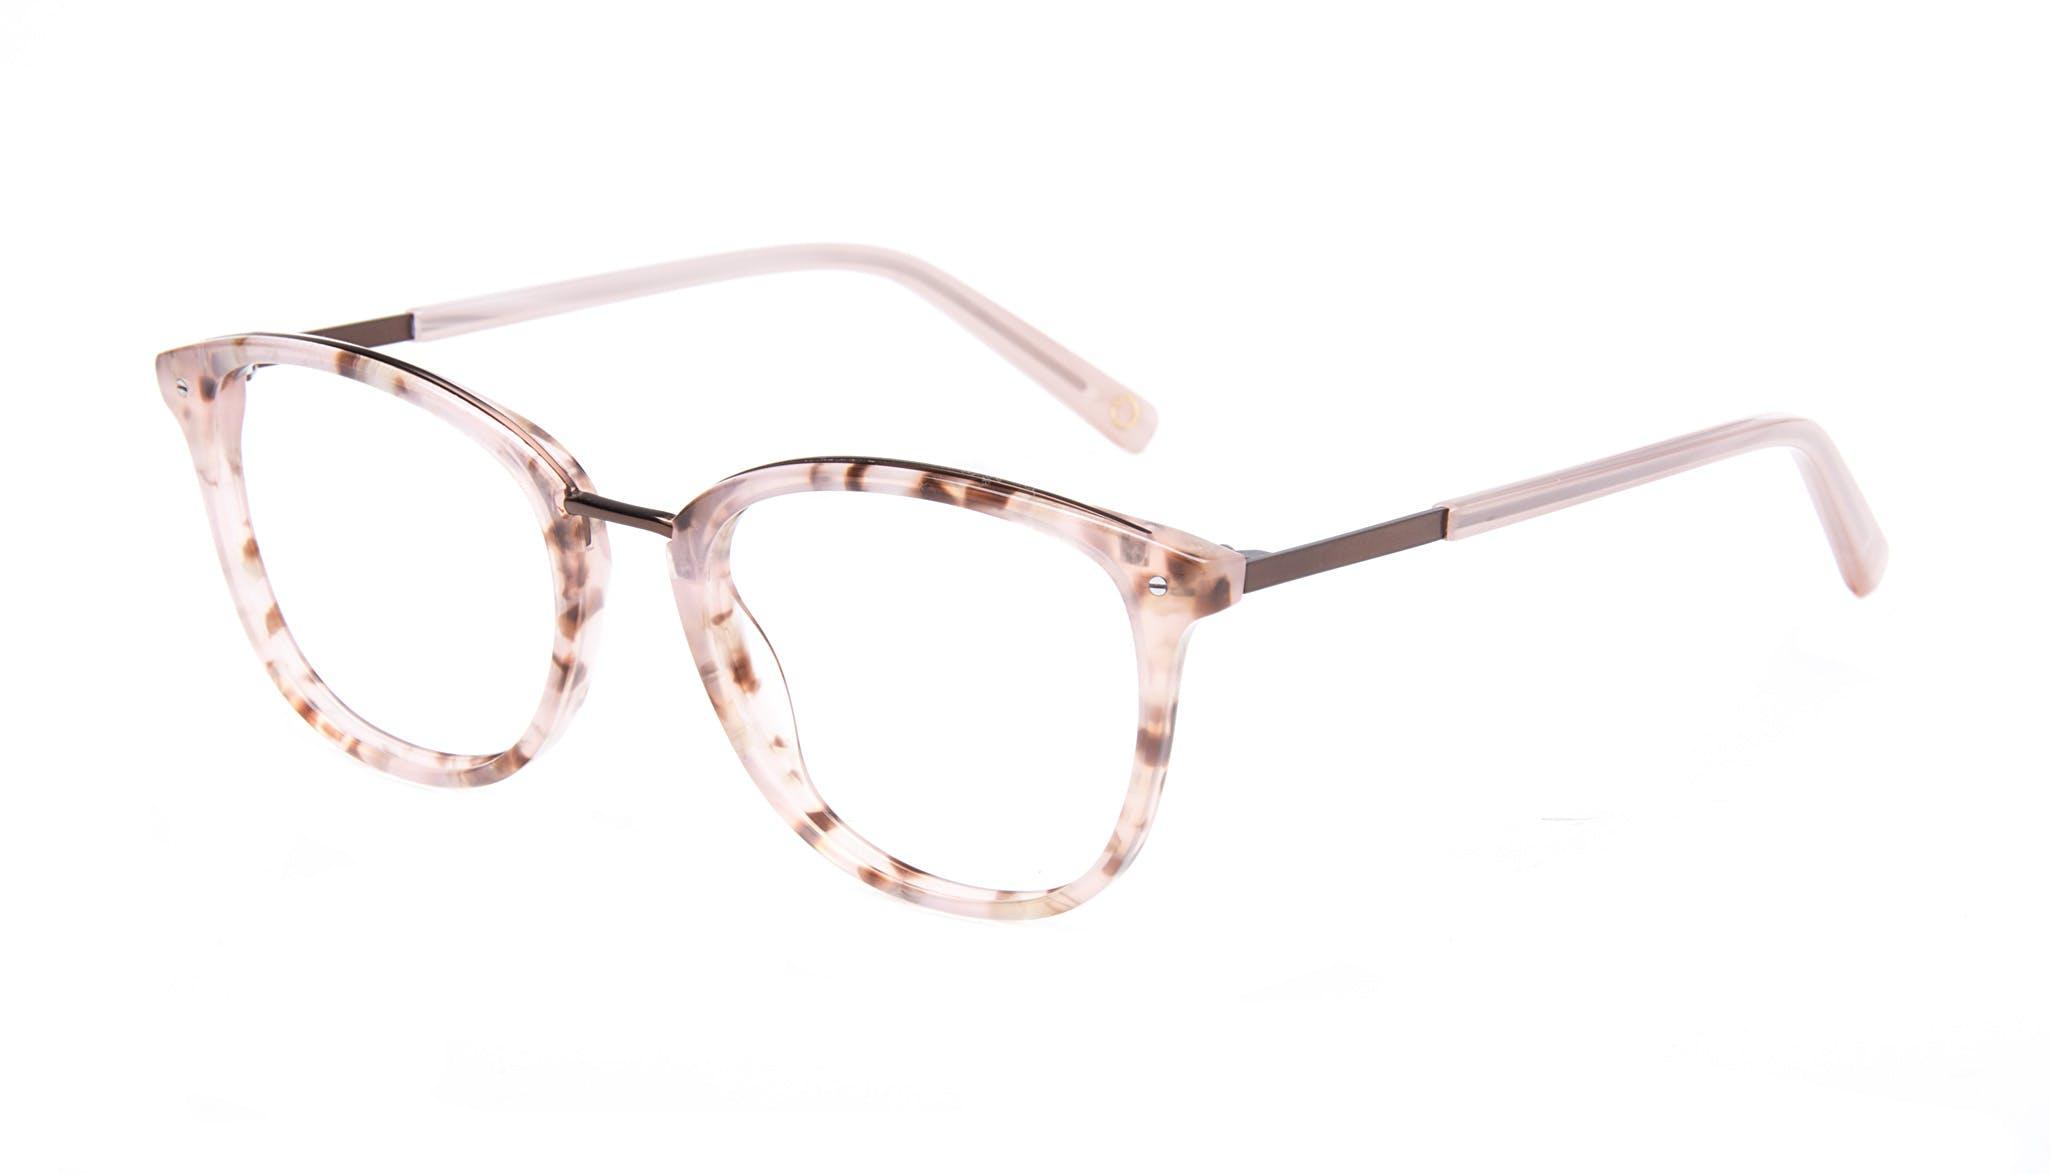 Affordable Fashion Glasses Square Round Eyeglasses Women Bella Blush Tortie Tilt